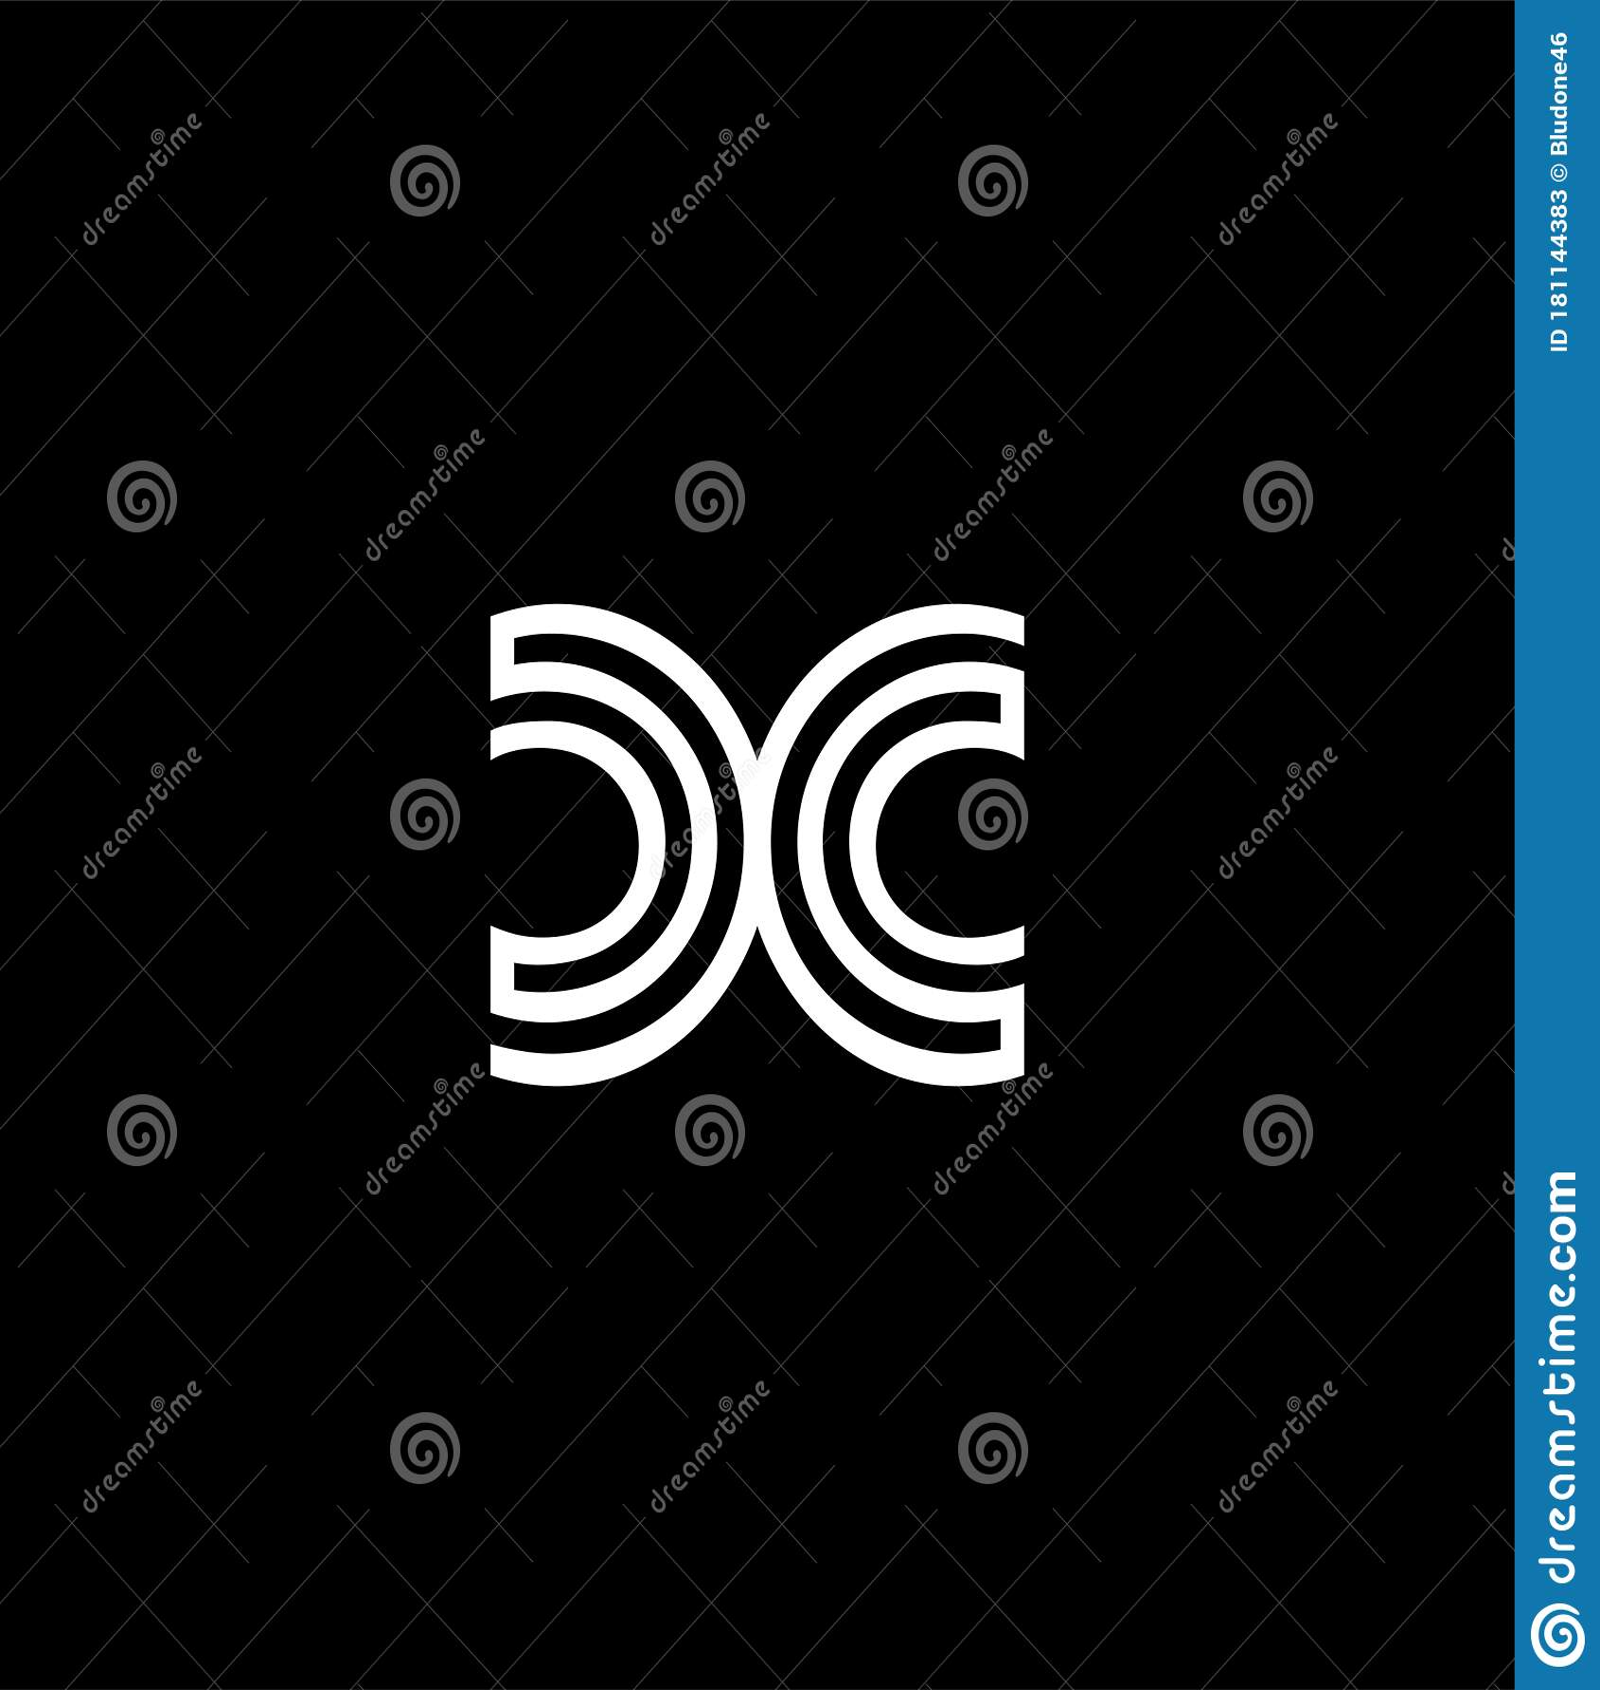 Initial Monogram Letter Cc Logo Design Vector Template Cc Letter Logo Design Stock Vector Illustration Of Designisolated Letters 181144383